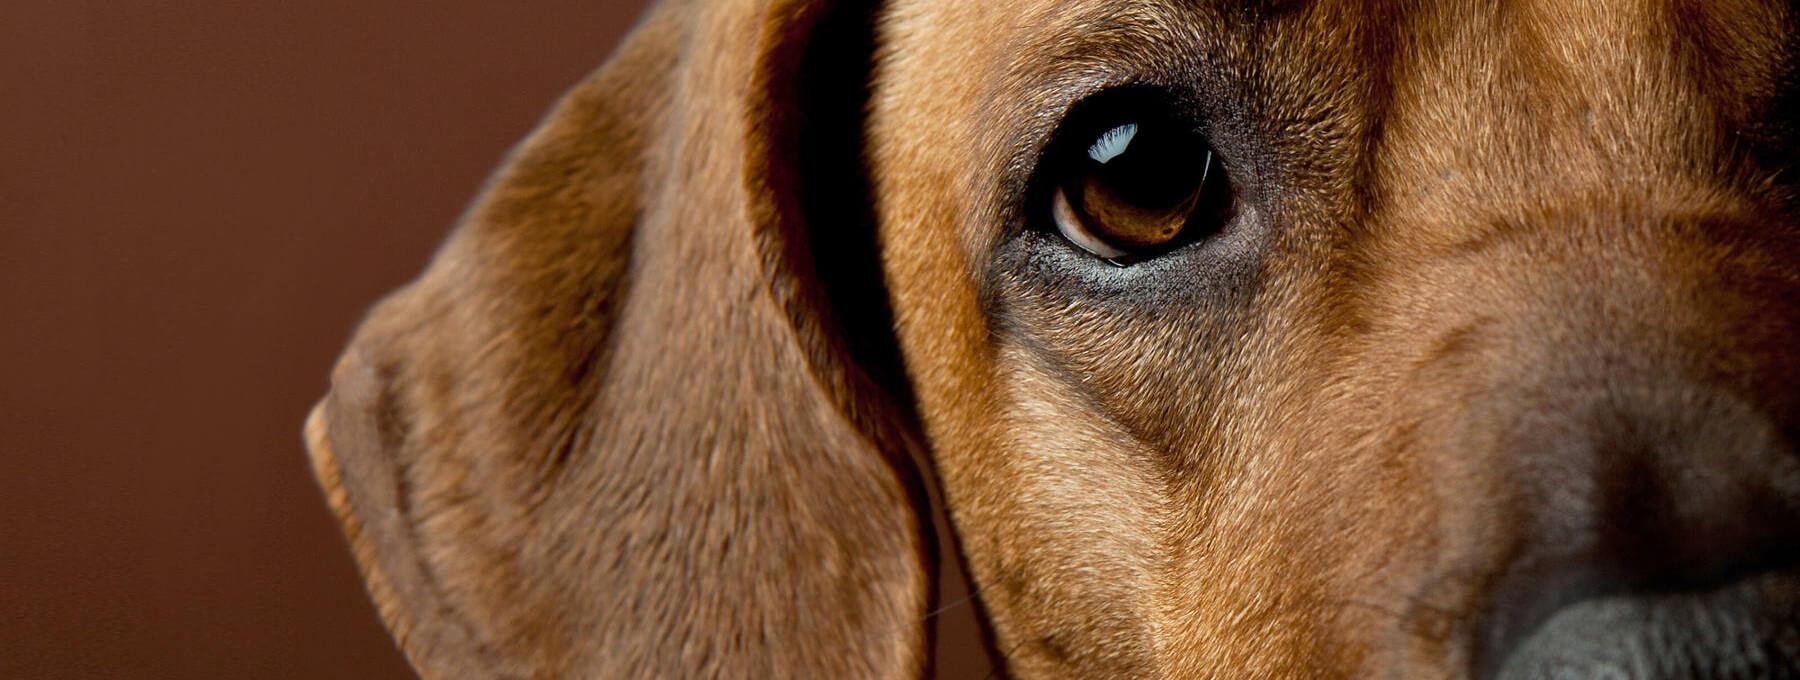 veterinaria-perro2